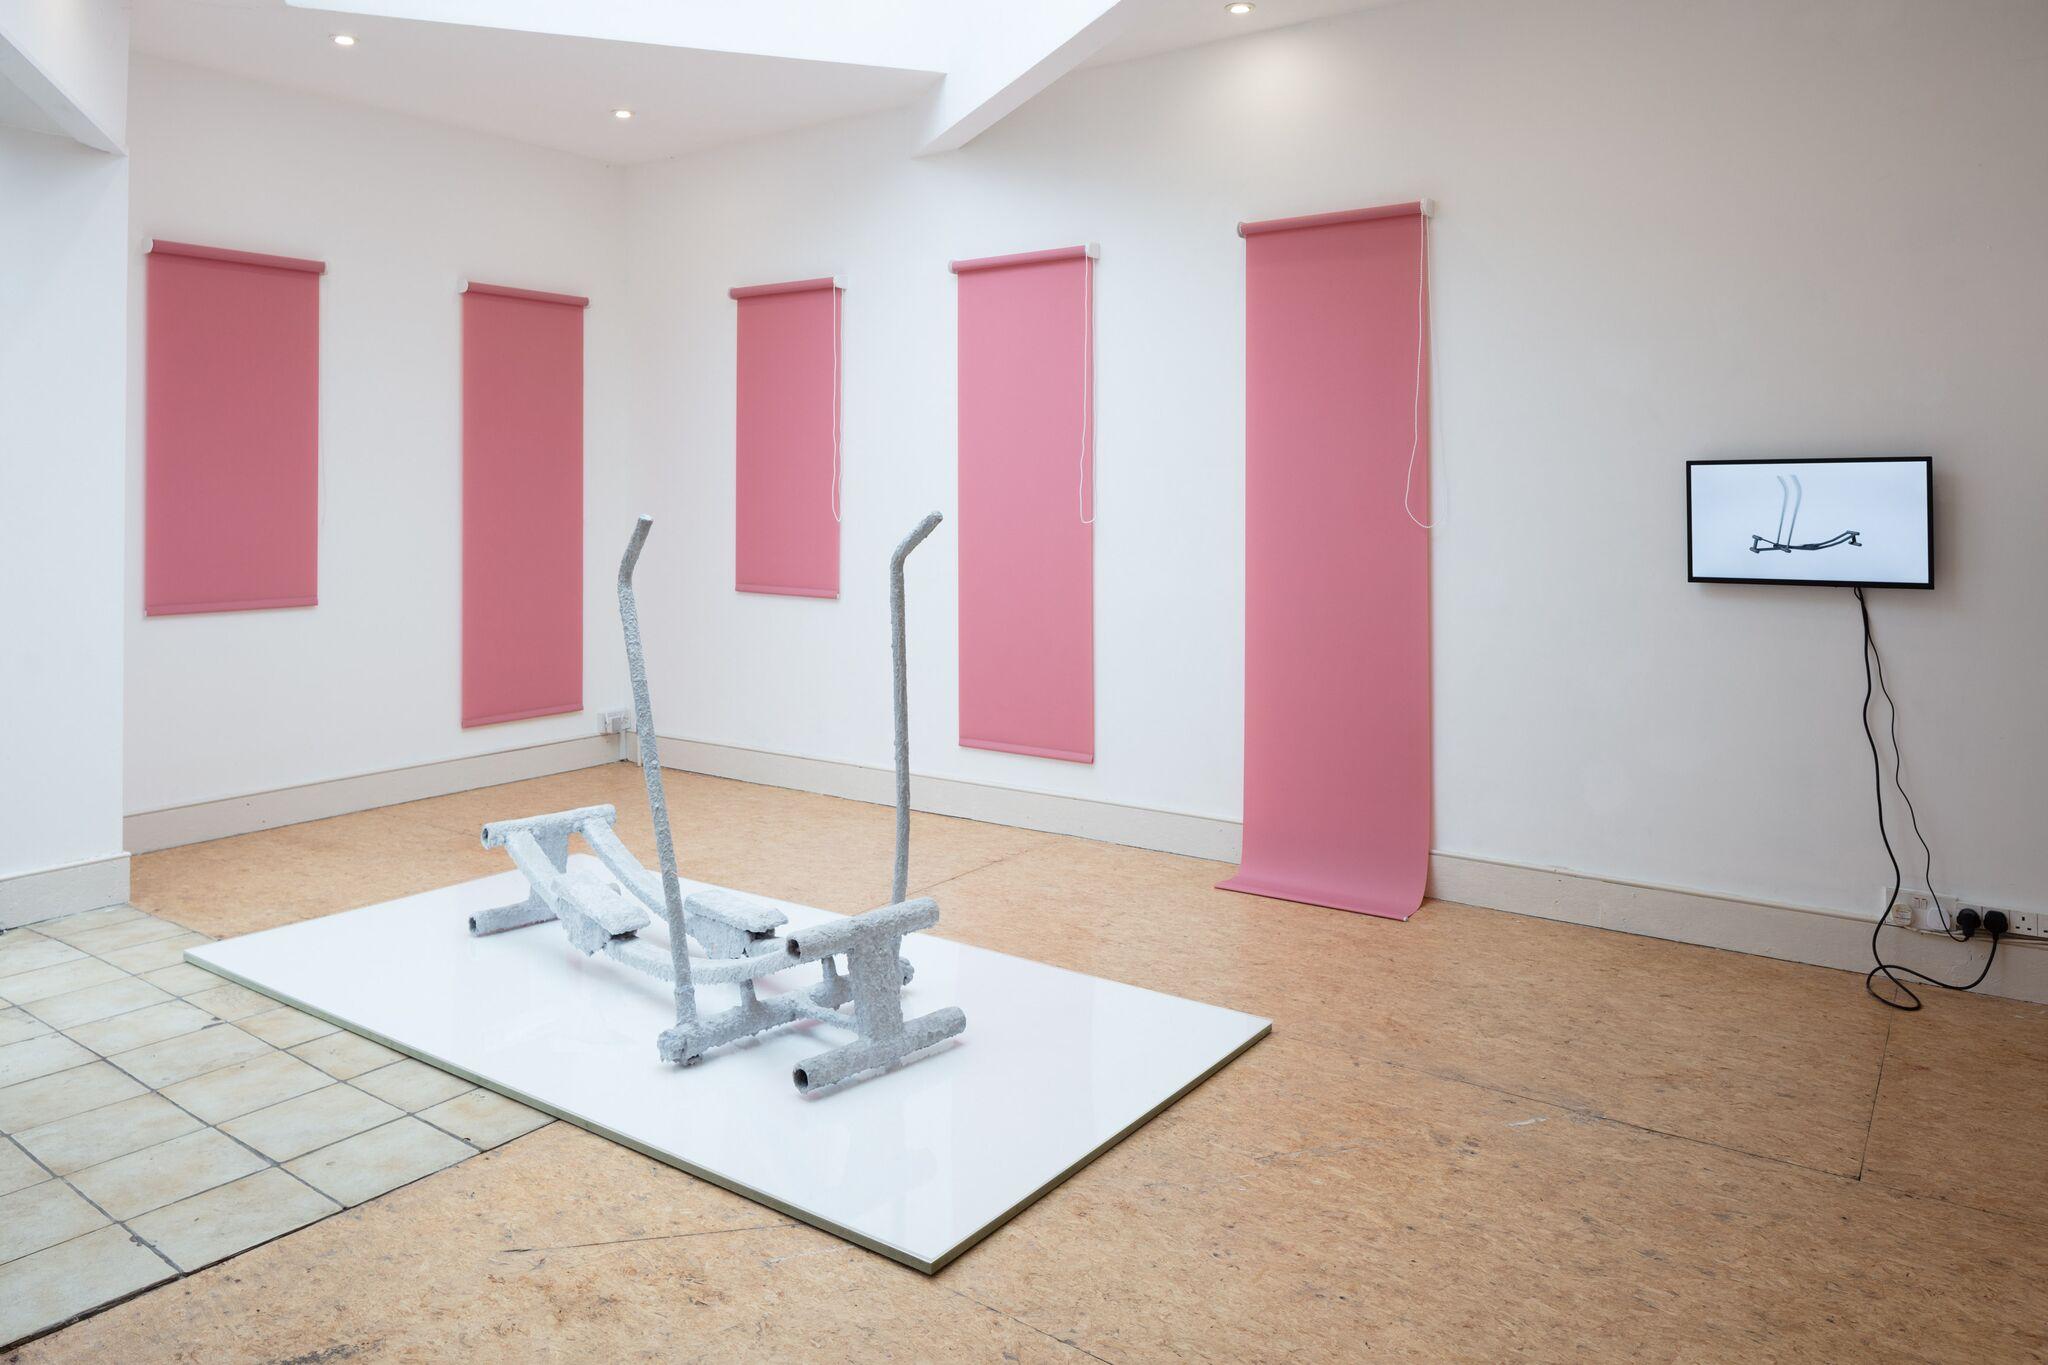 Ben Cain, Passive Imperative Participation Vibe, installation view, 2018. Documentation: Plastiques Photography (Ben Cain - Passive Imperative Participation Vibe 14)